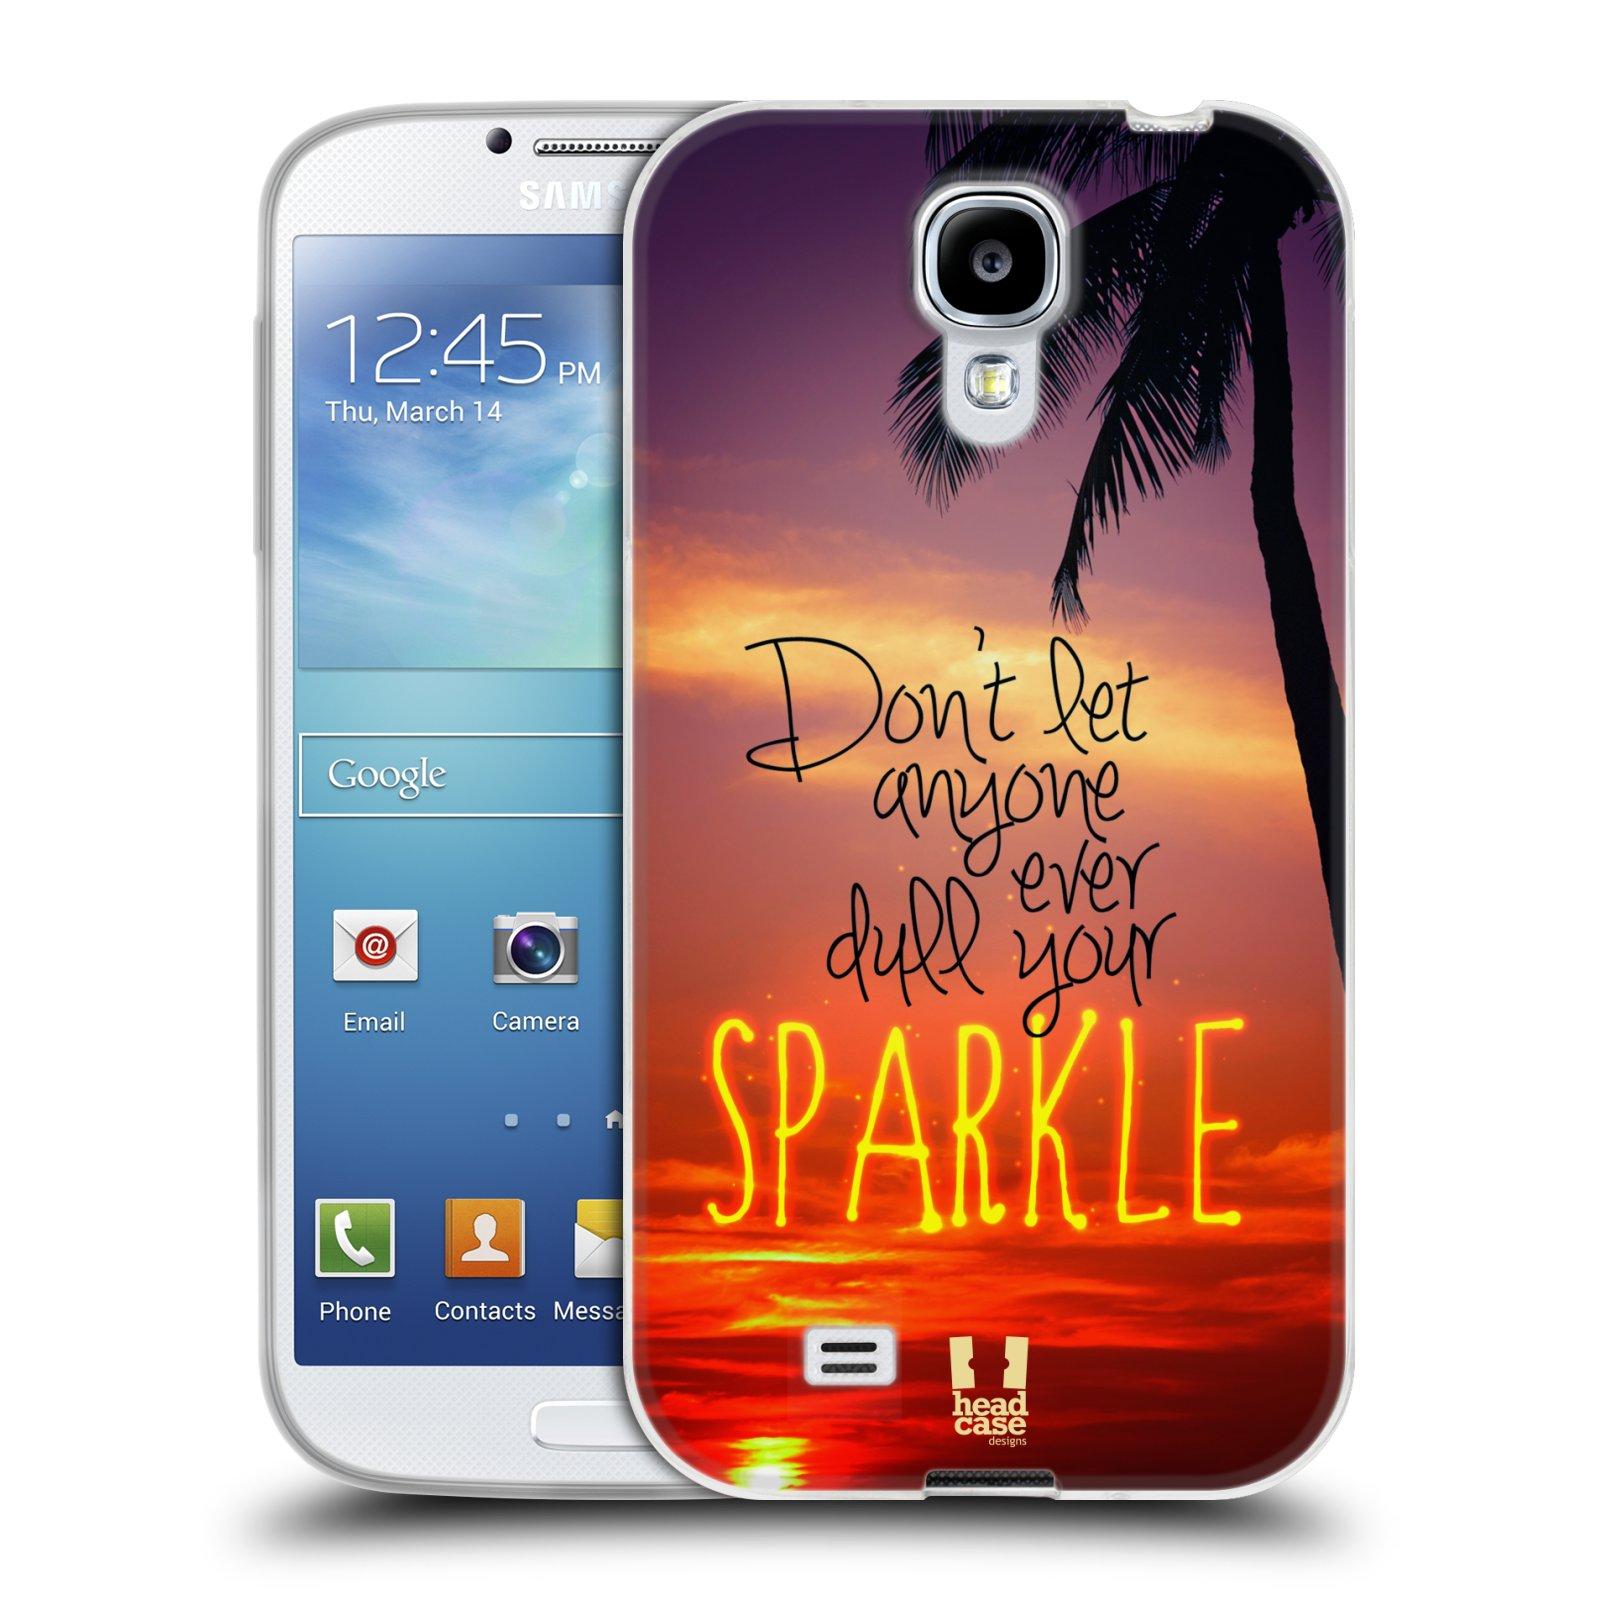 Silikonové pouzdro na mobil Samsung Galaxy S4 HEAD CASE SPARKLE (Silikonový kryt či obal na mobilní telefon Samsung Galaxy S4 GT-i9505 / i9500)